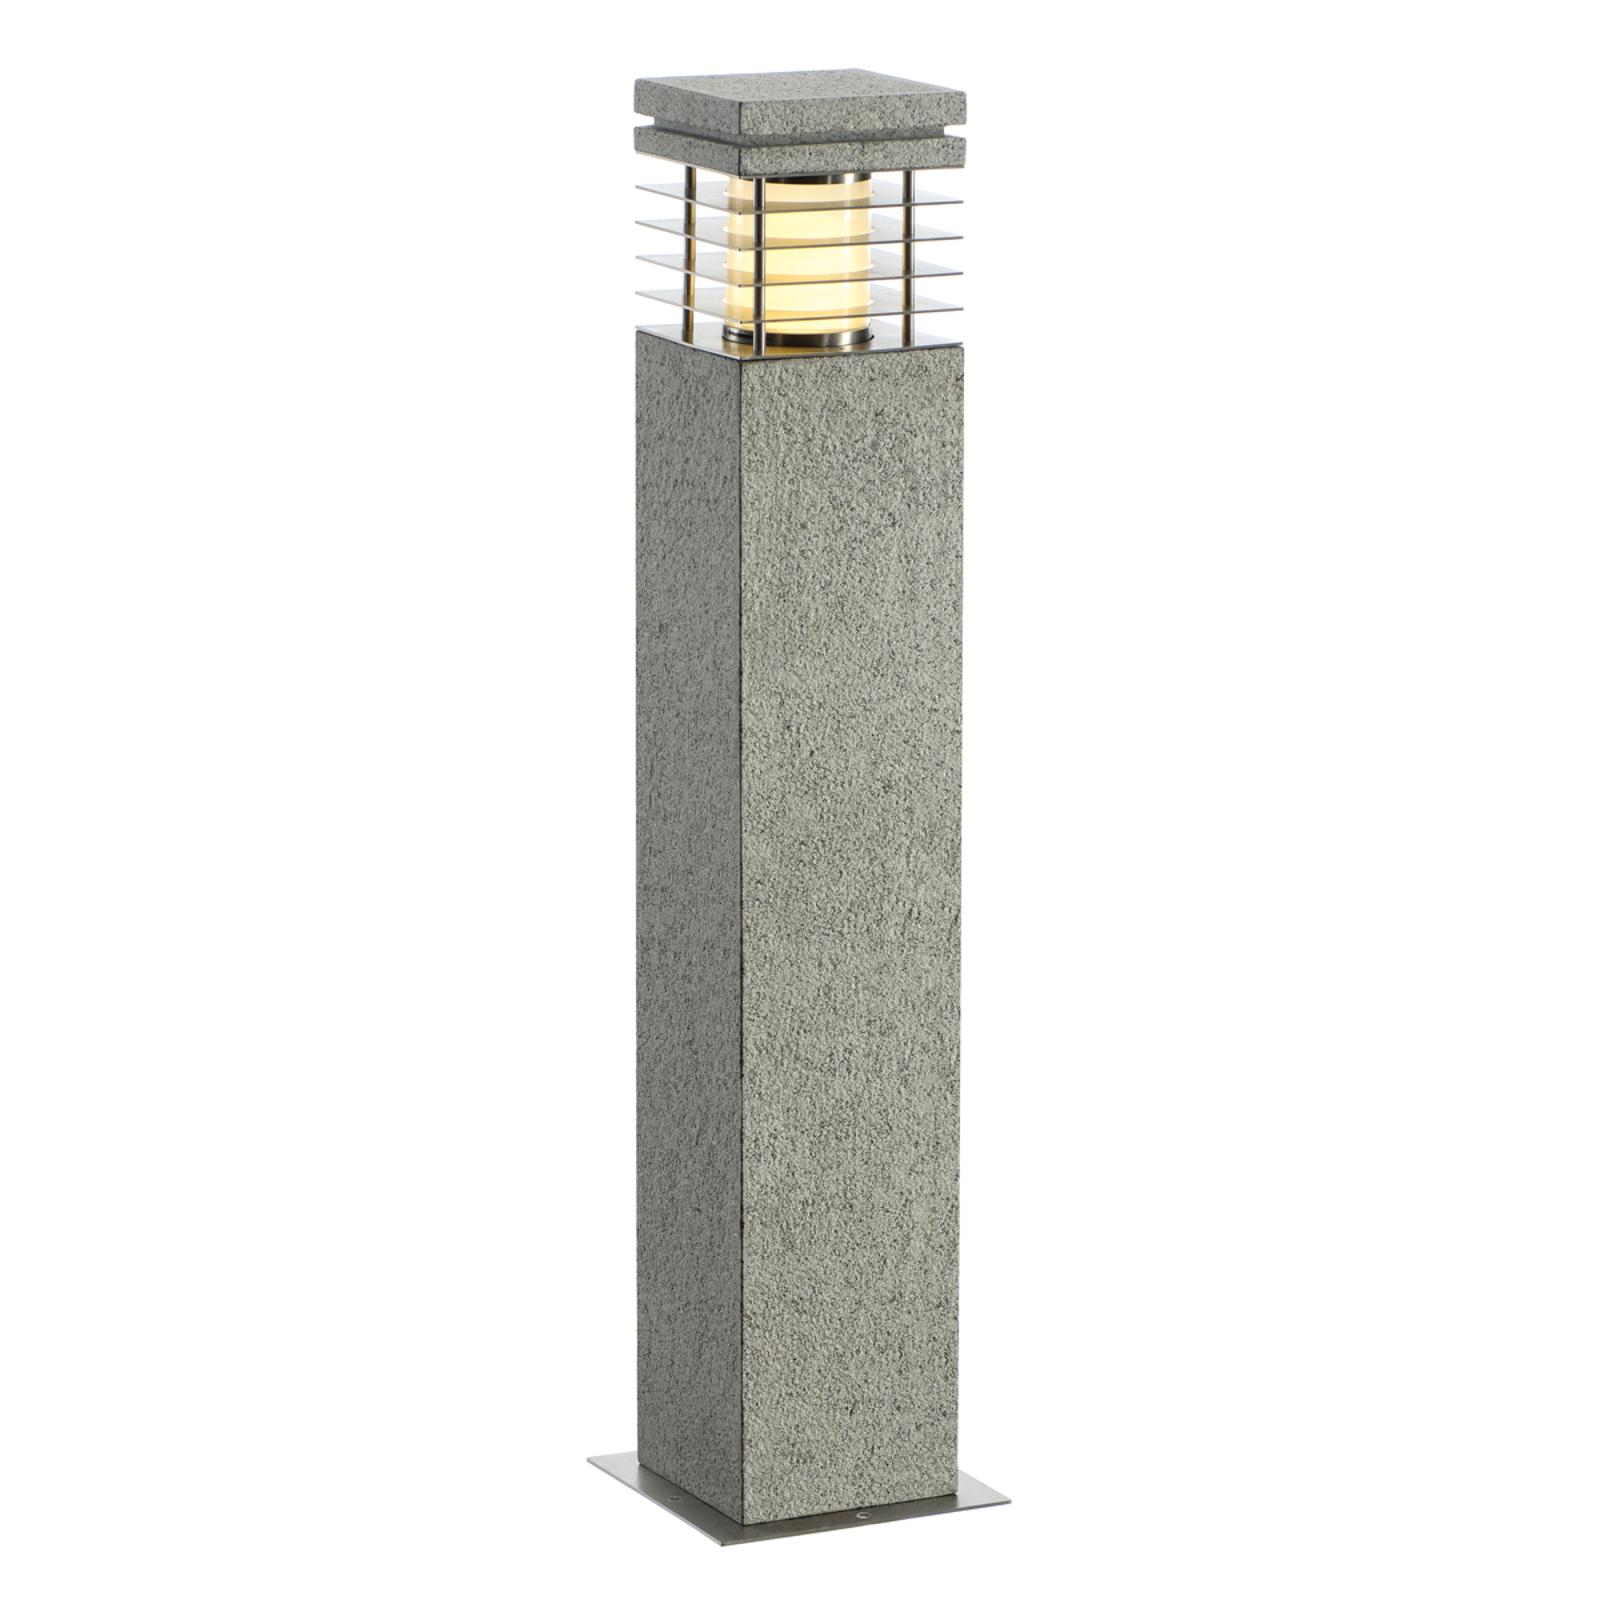 Borne lumineuse en grès ARROCK aspect granite